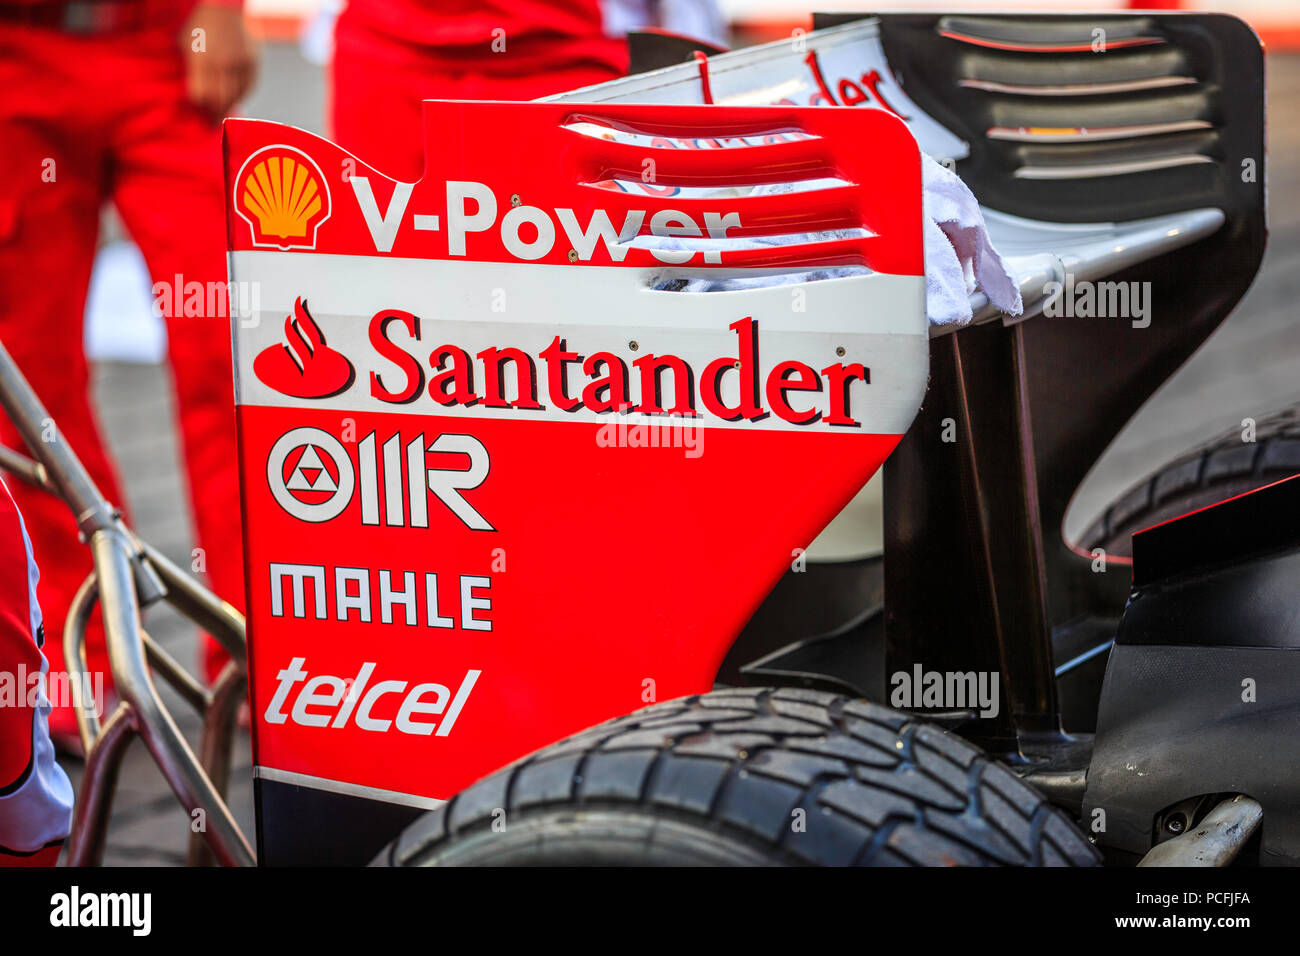 Mexico City, Mexico - July 08, 2015: Ferrari F1 F60 Rear Wing Sponsors. At the Scuderia Ferrari Street Demo By Telcel - Infinitum. - Stock Image